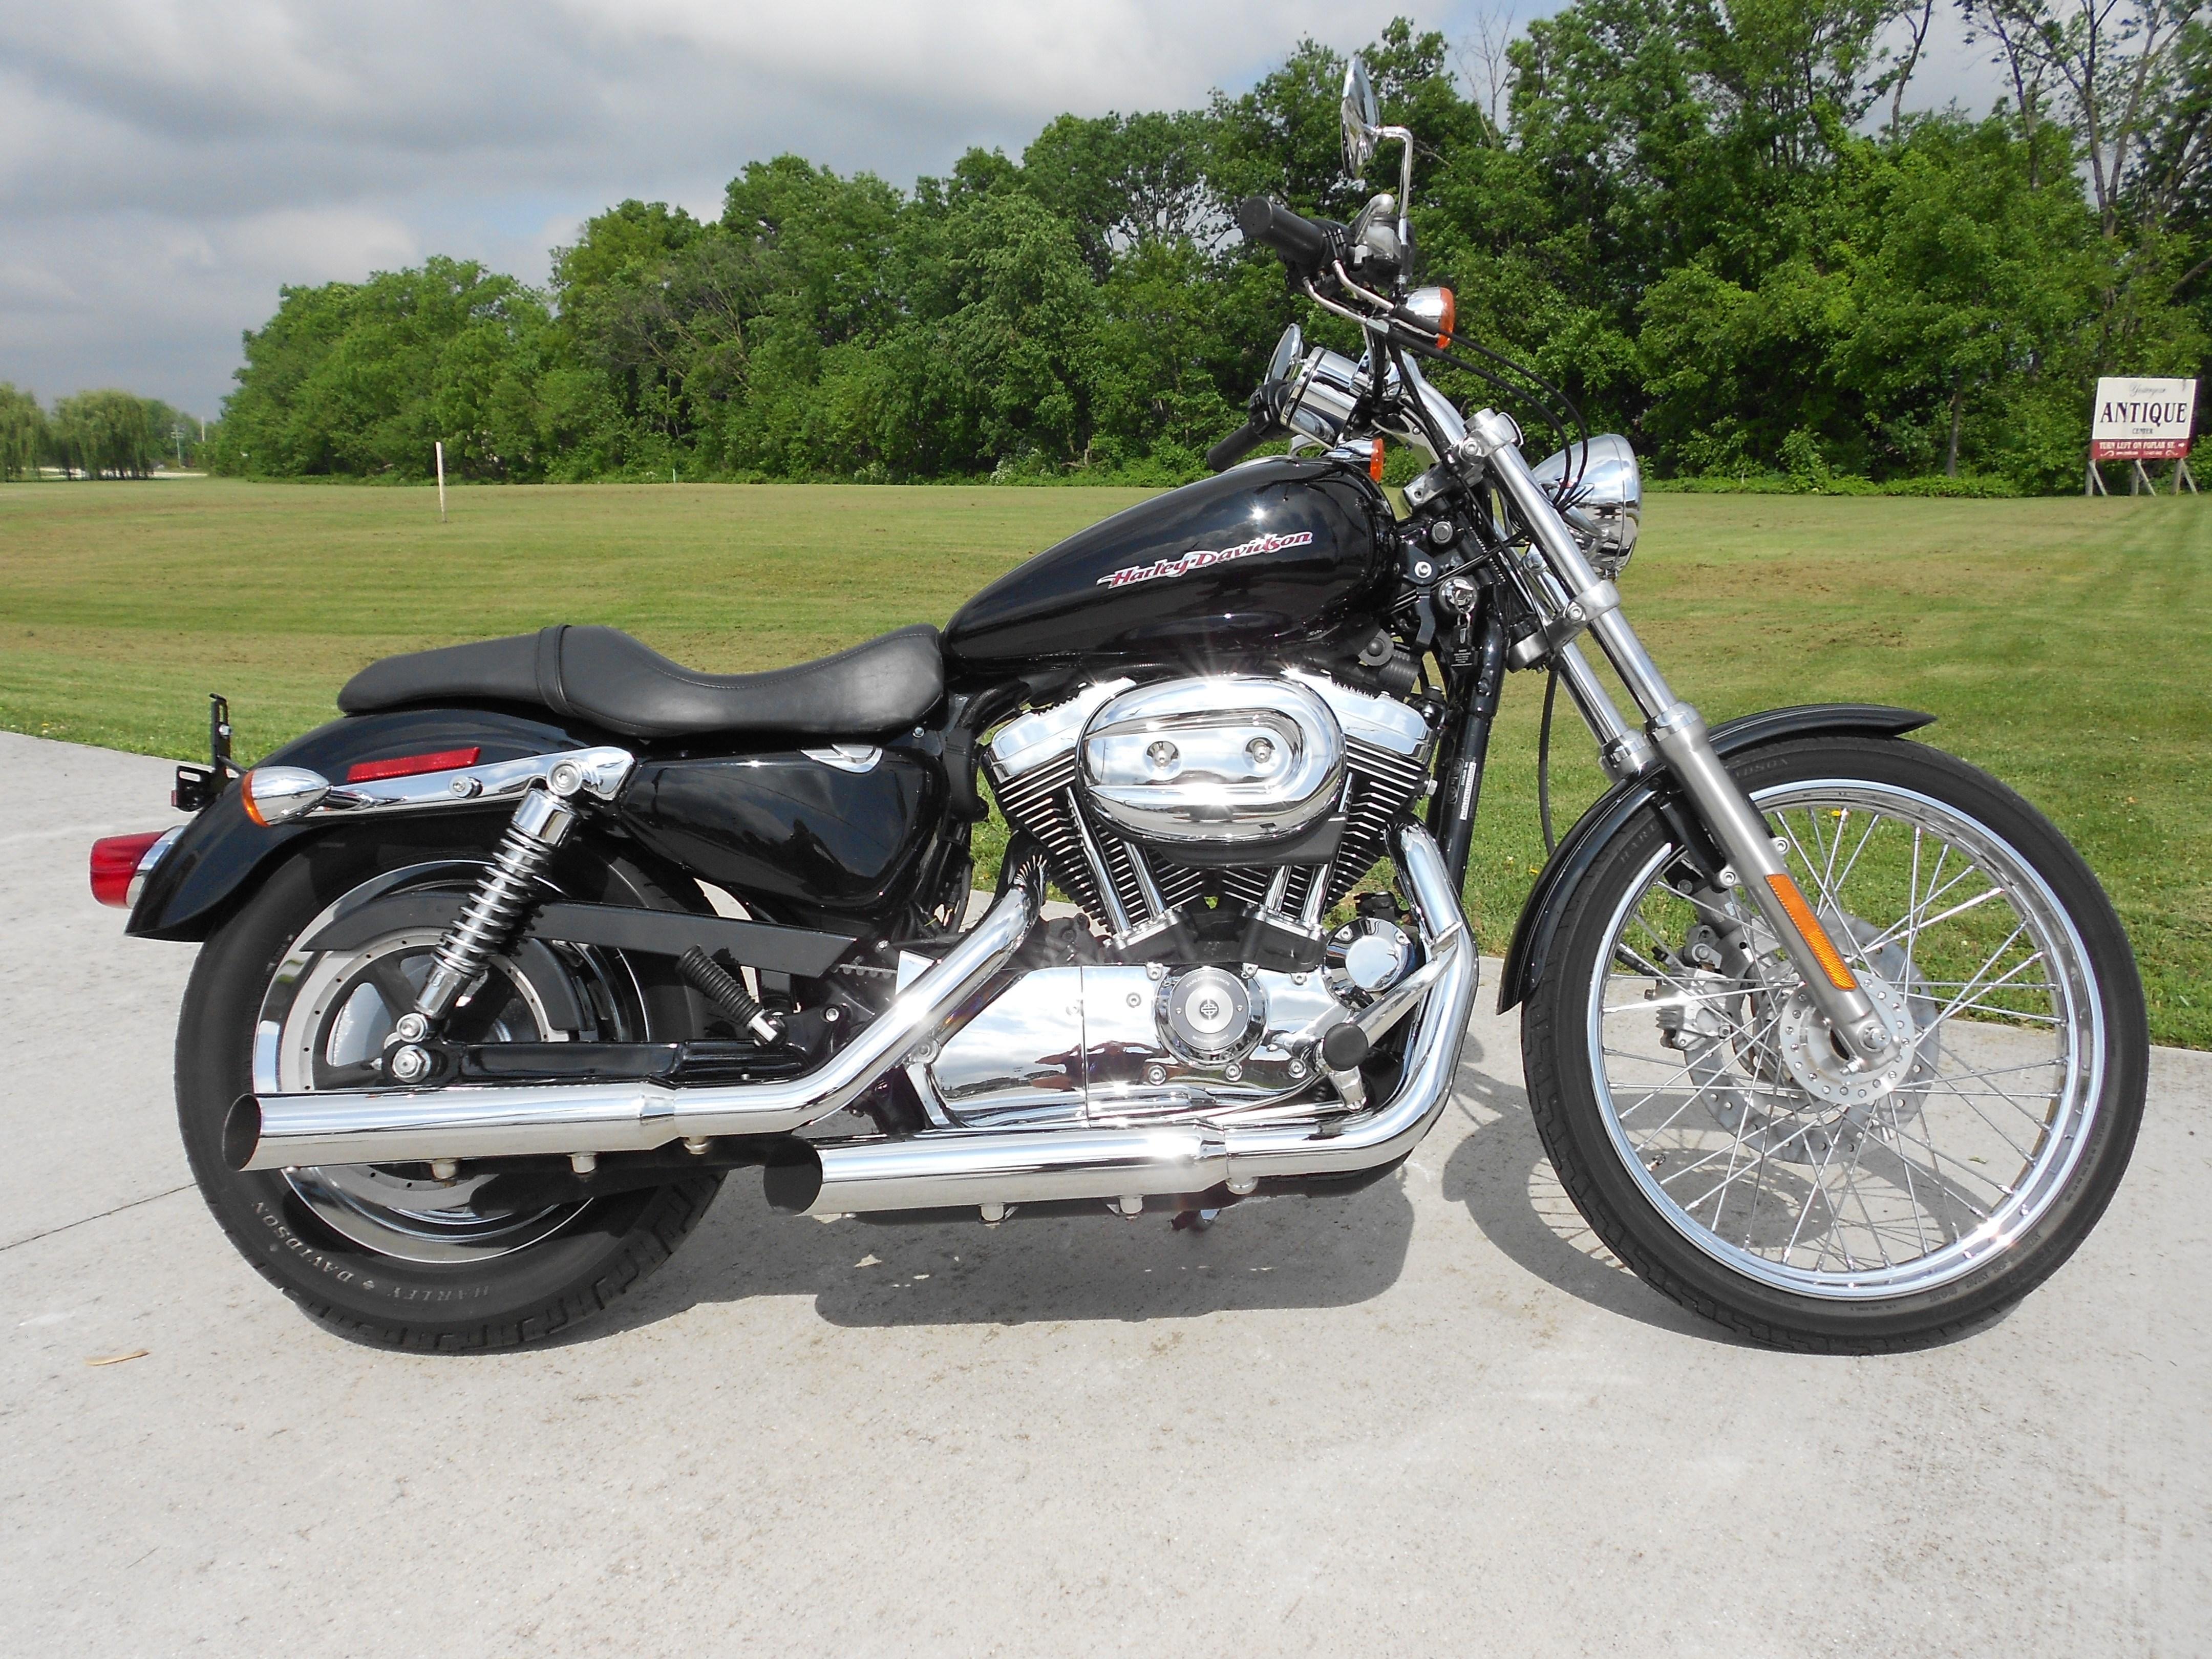 2007 Harley-Davidson® XL1200C Sportster